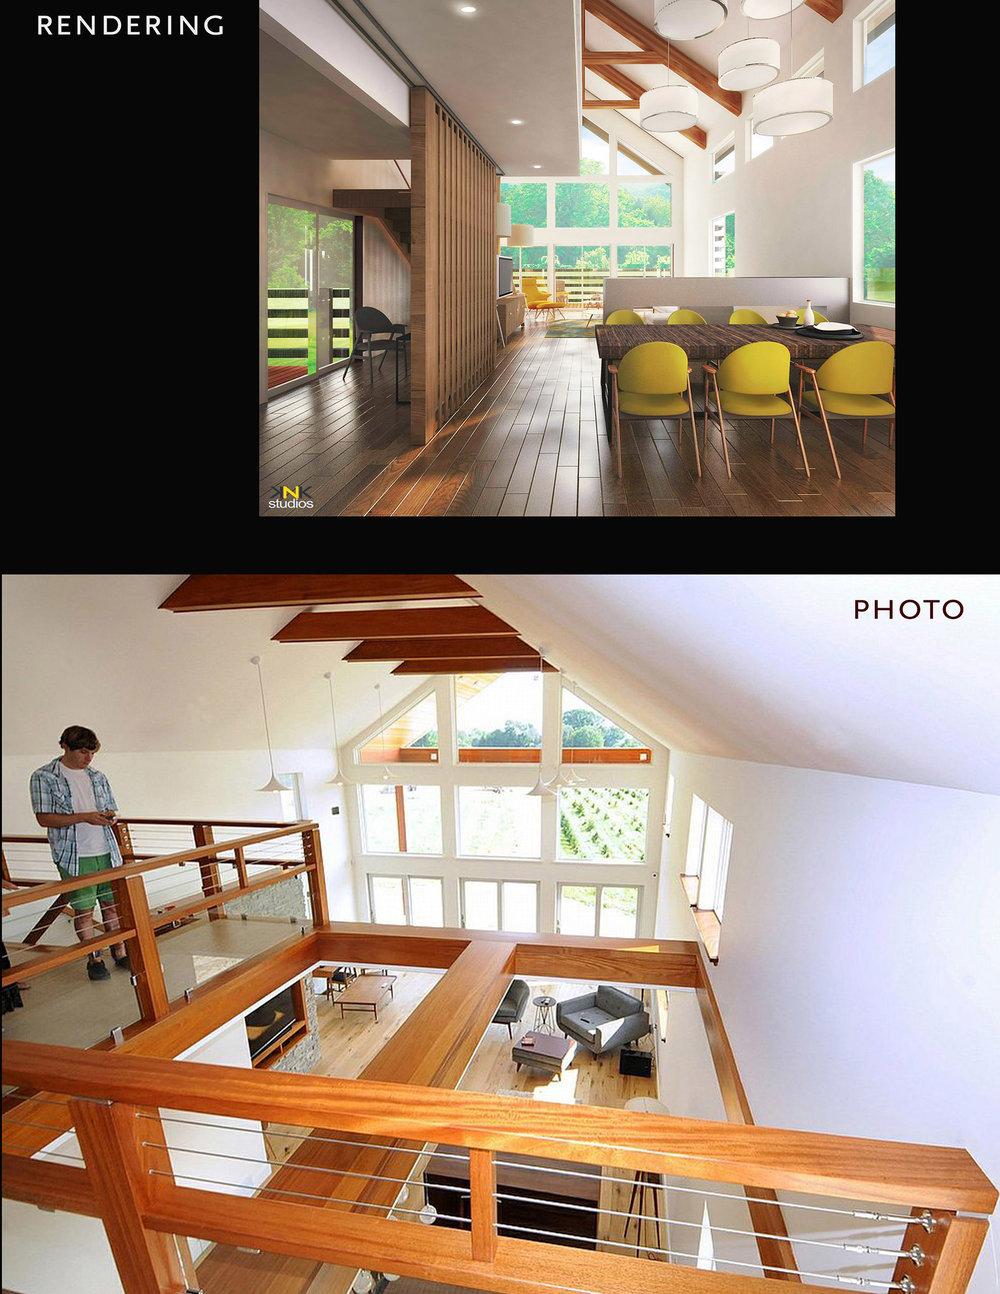 Interior_examples7.jpg